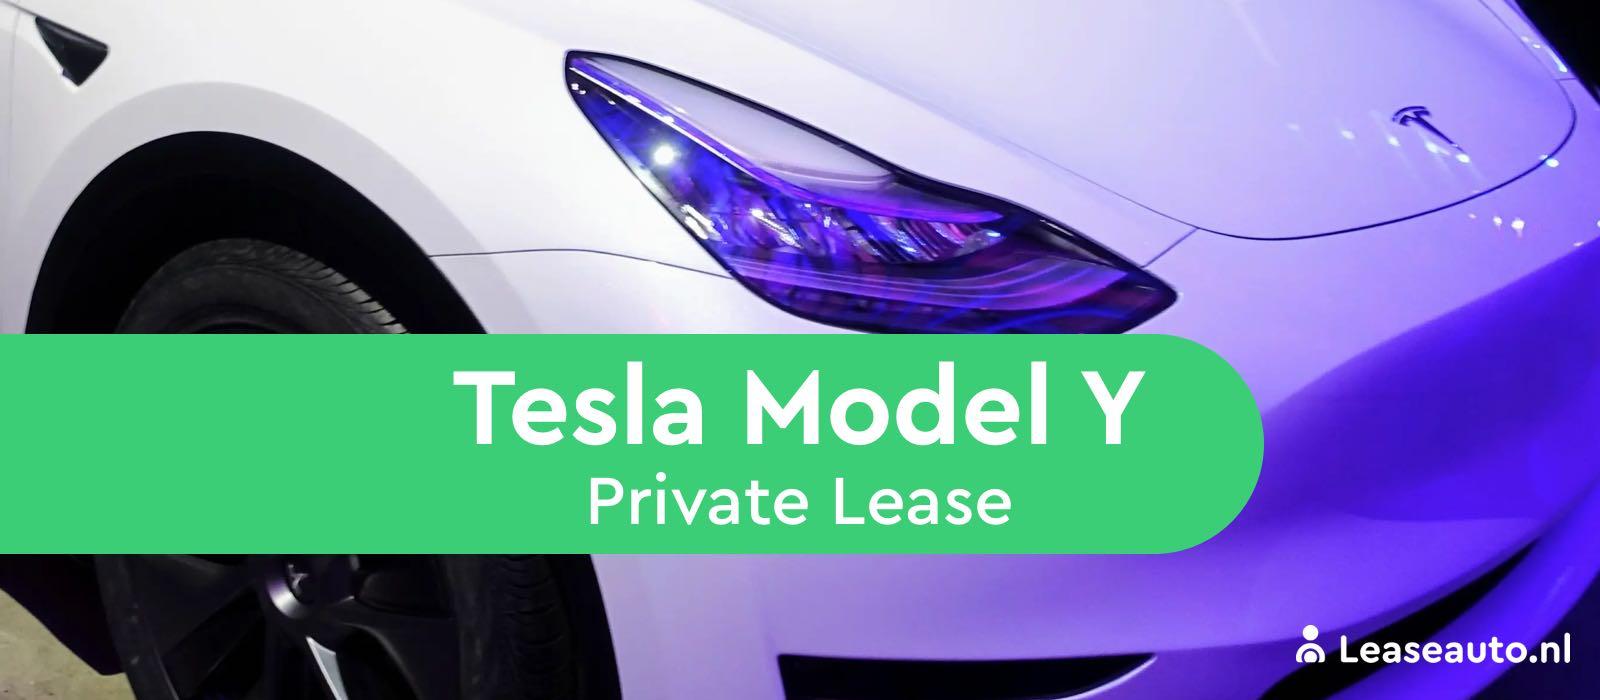 tesla model y private lease